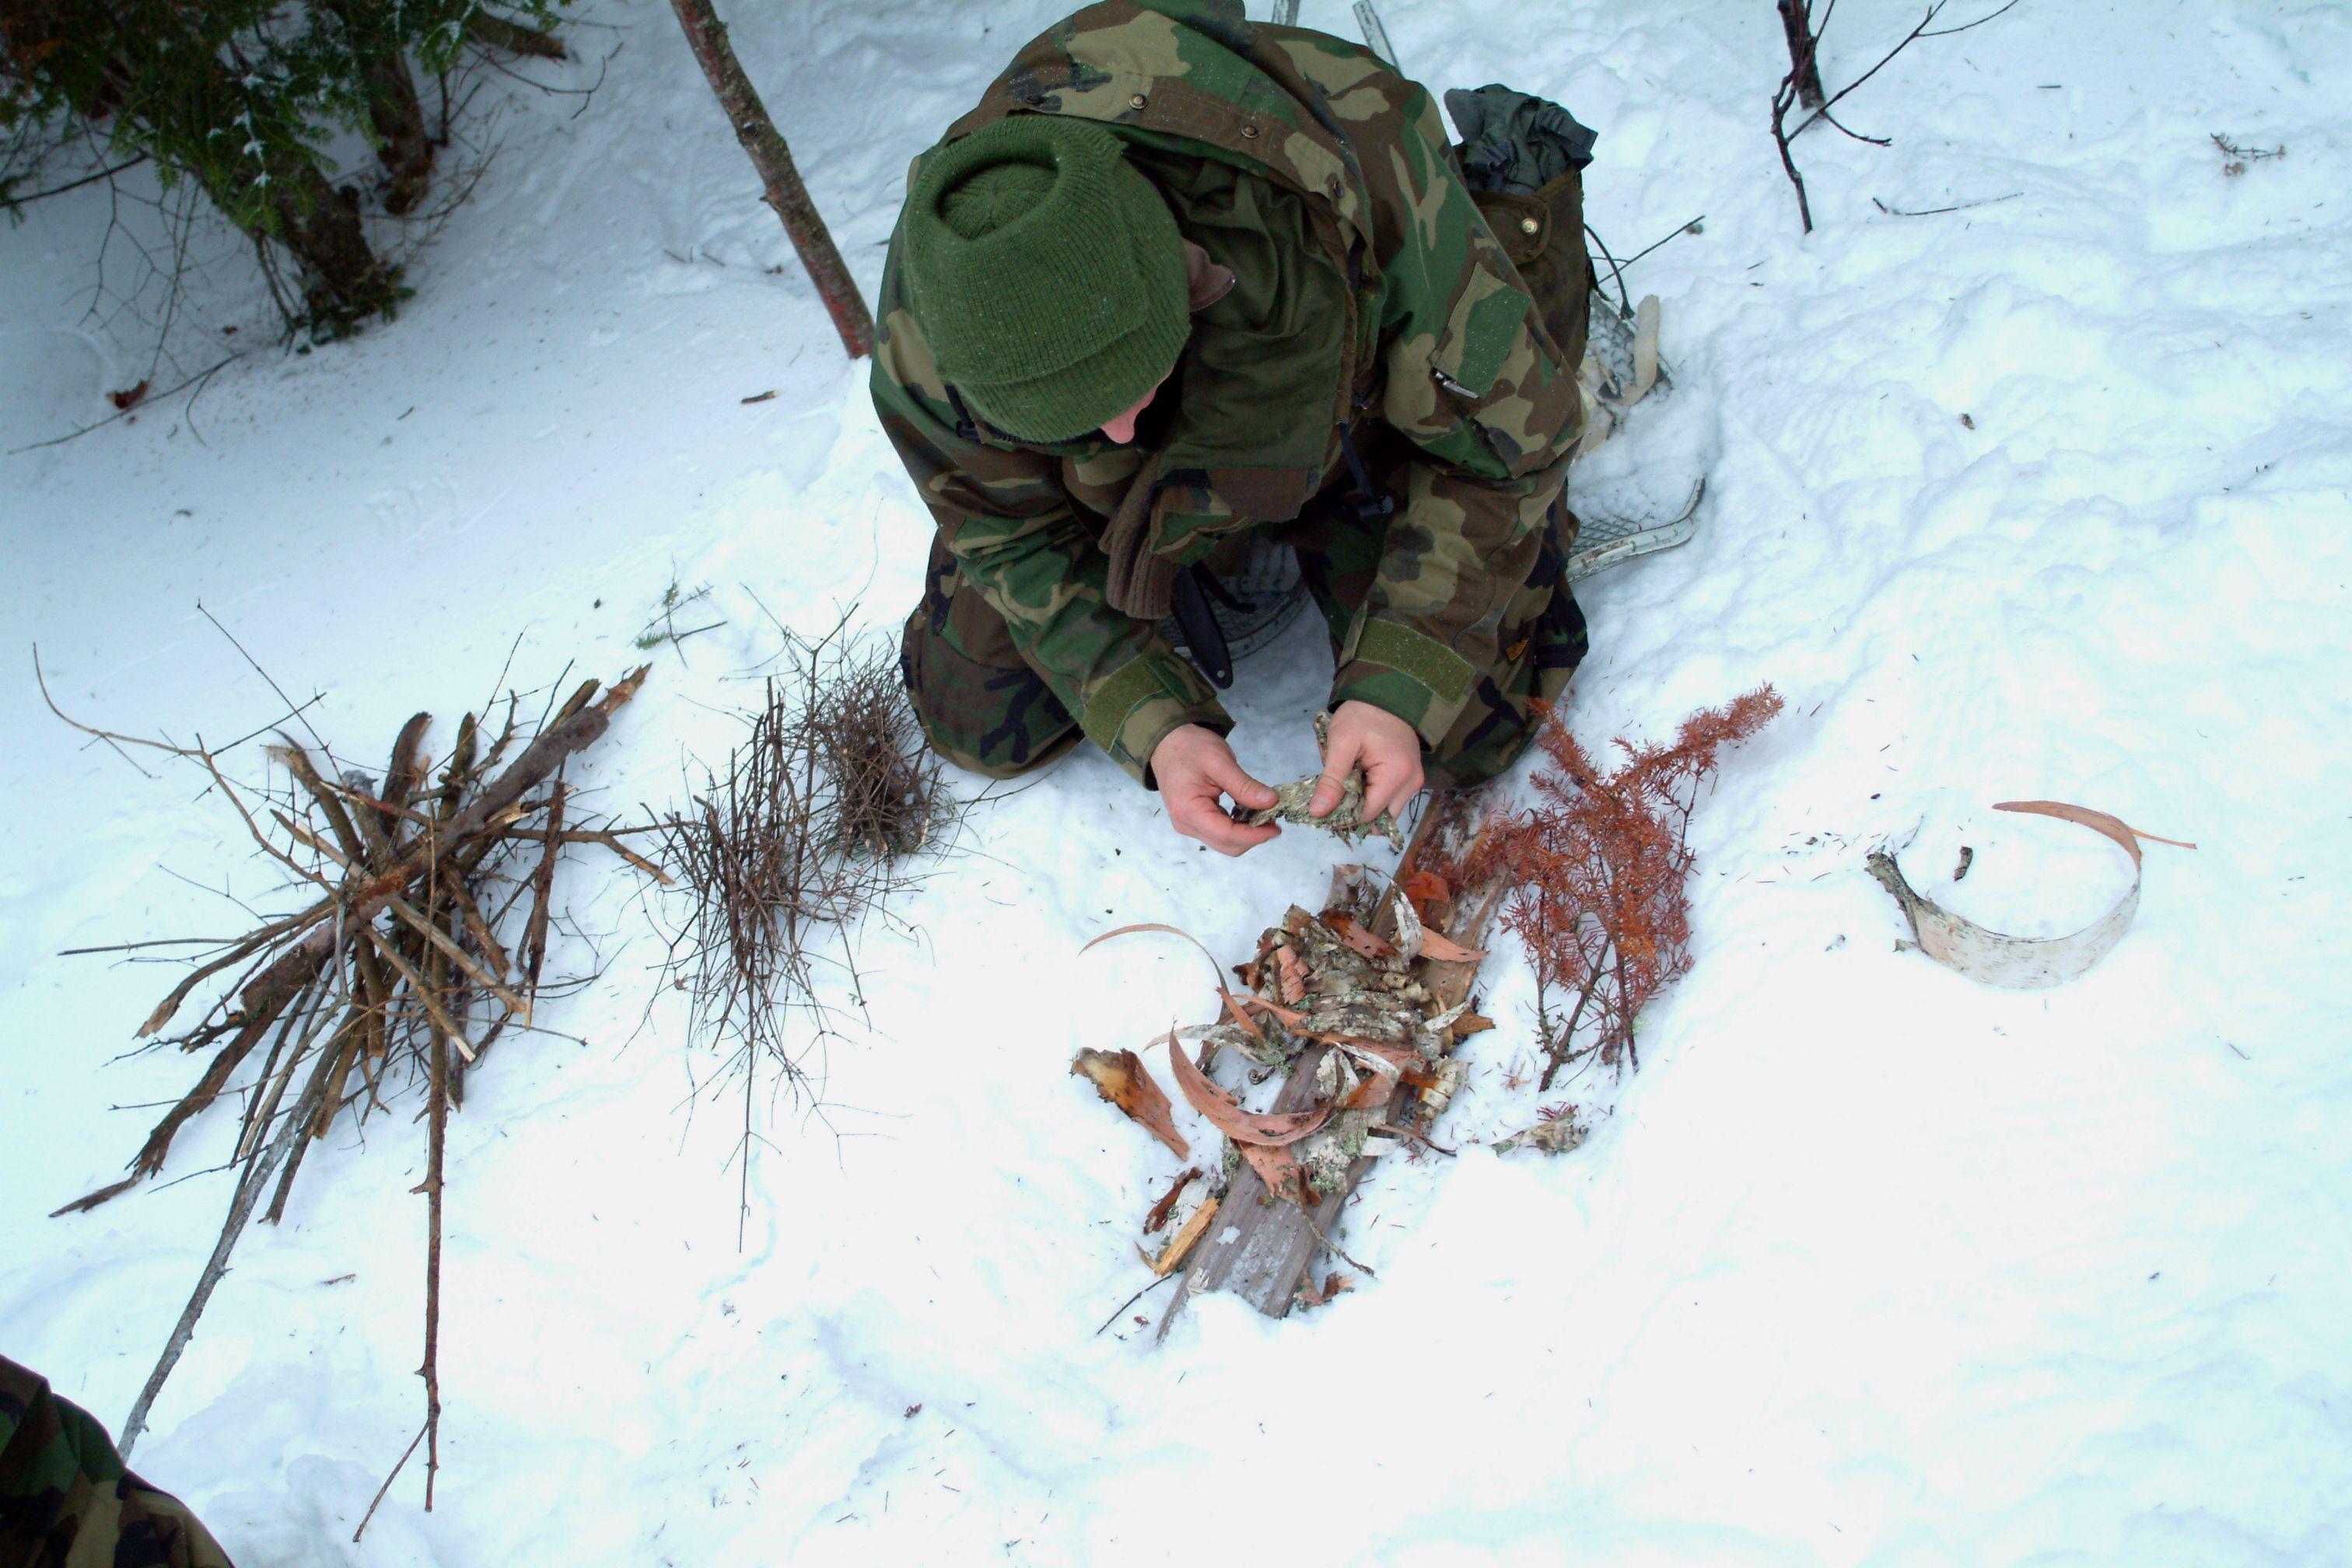 Winter Wilderness Survival Guide